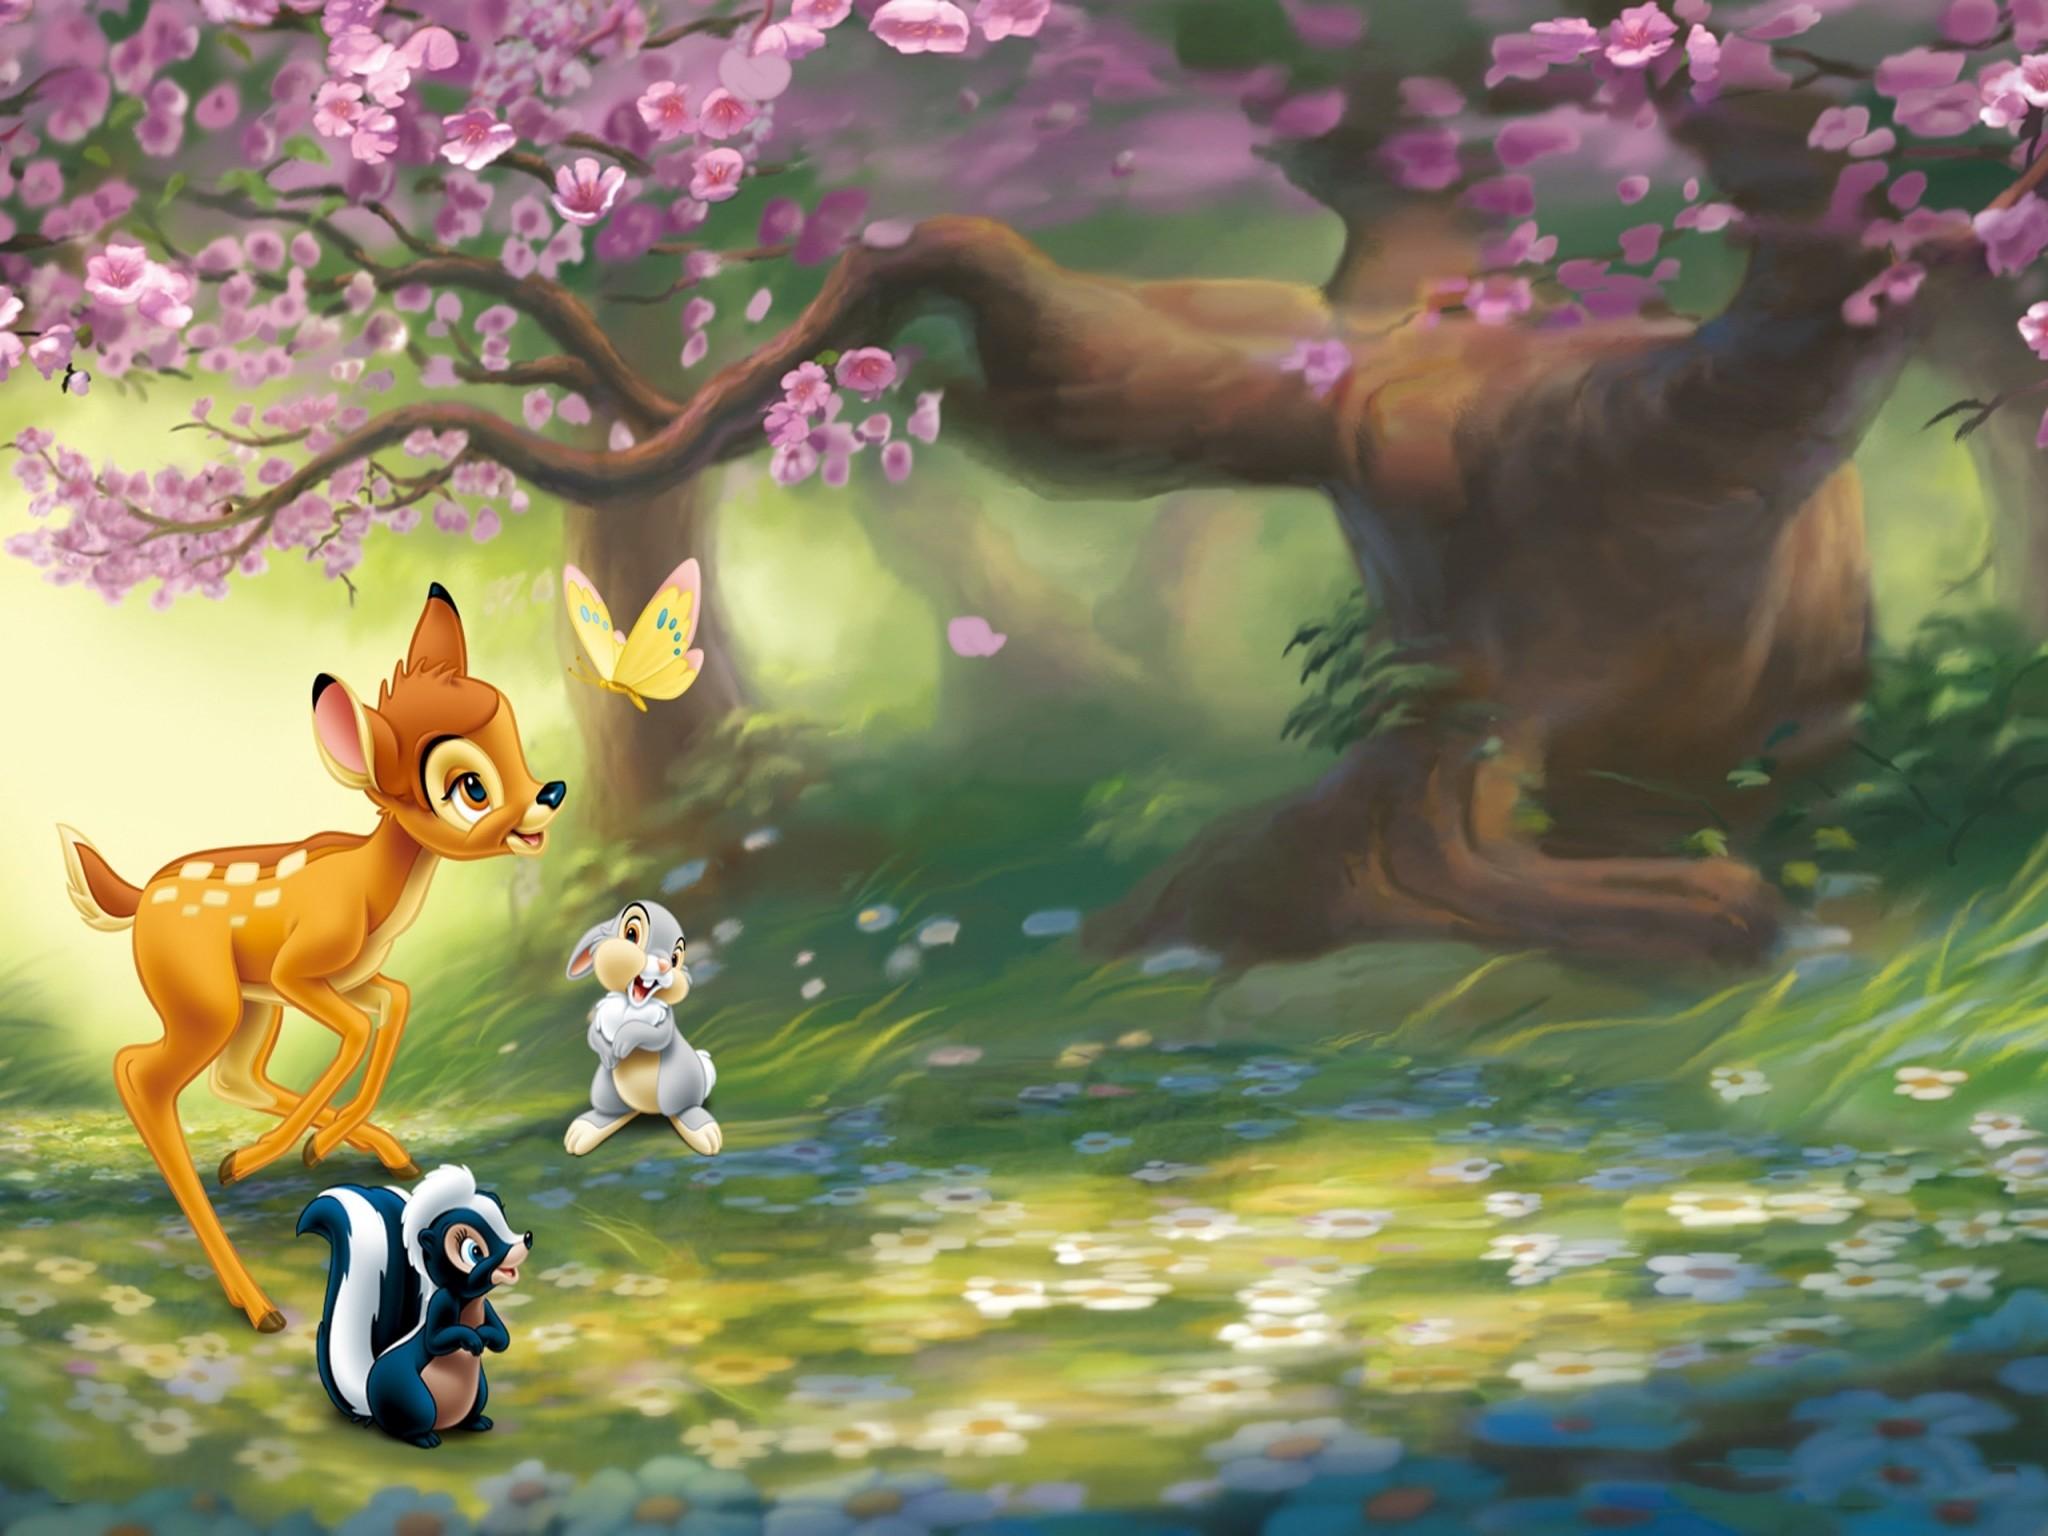 Bambi Spring Wallpaper | … URL: https://www.wallm